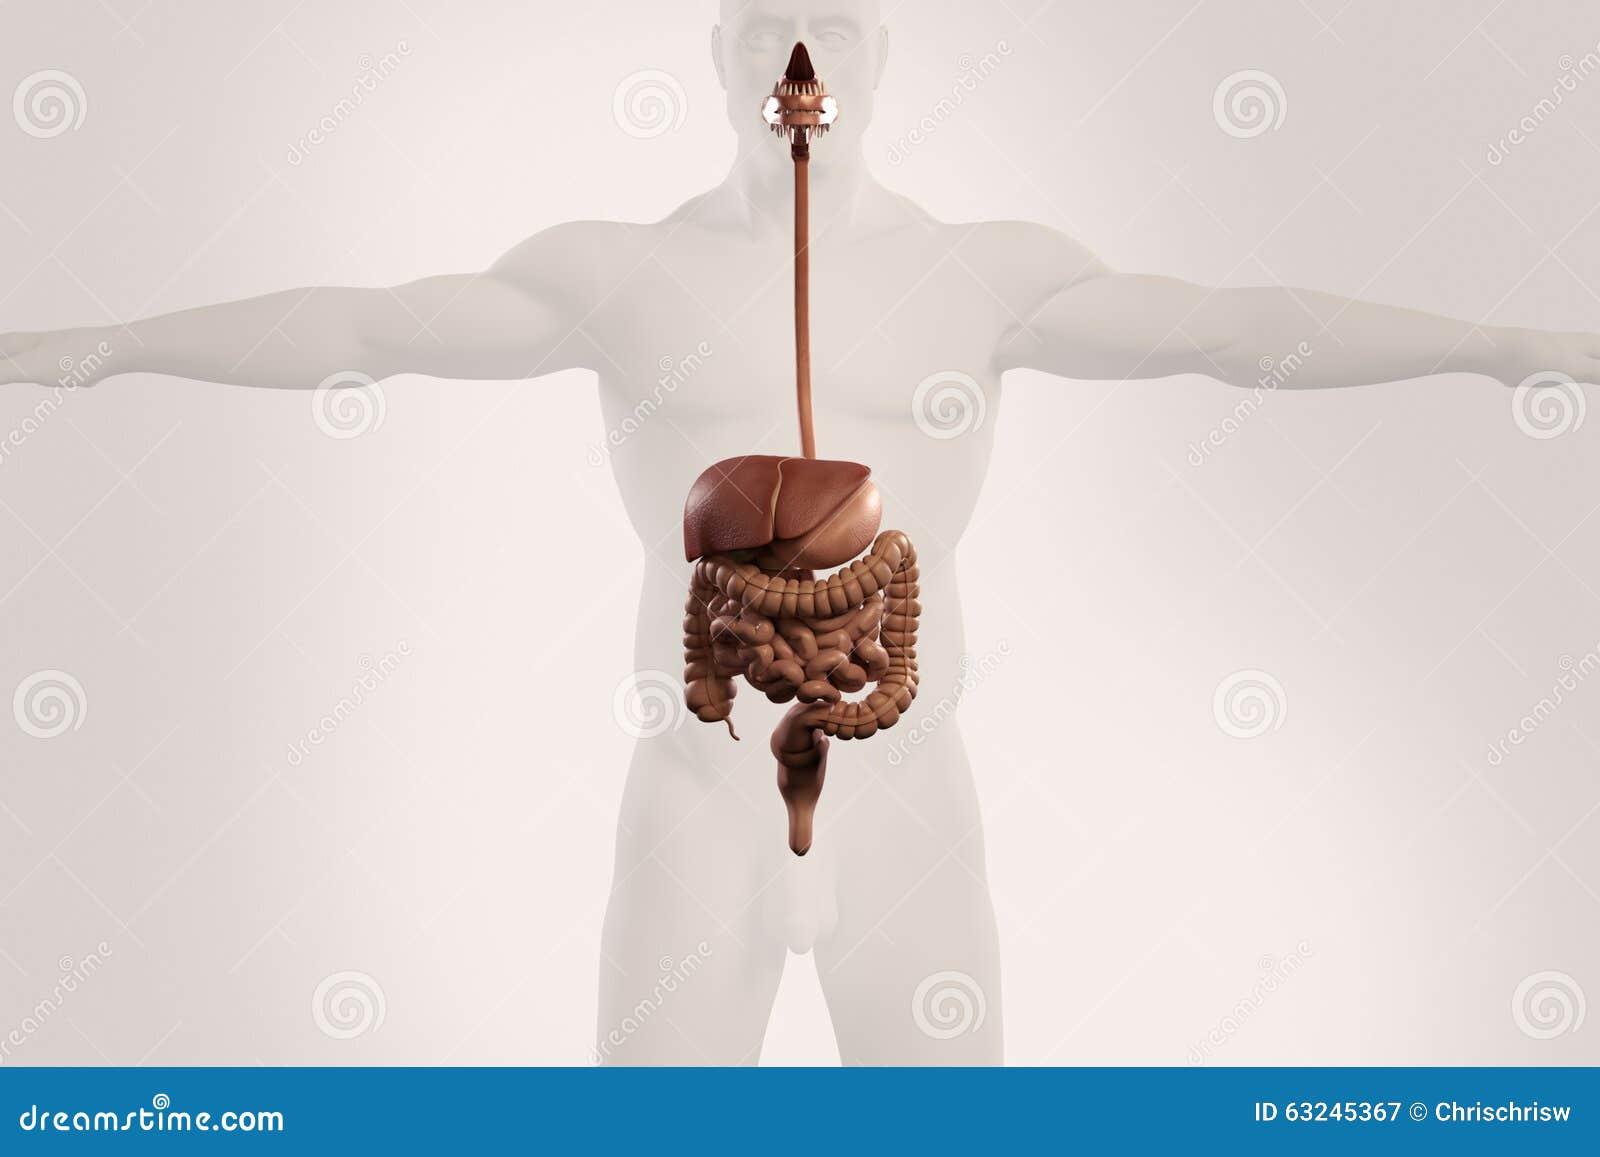 outline of digestive system